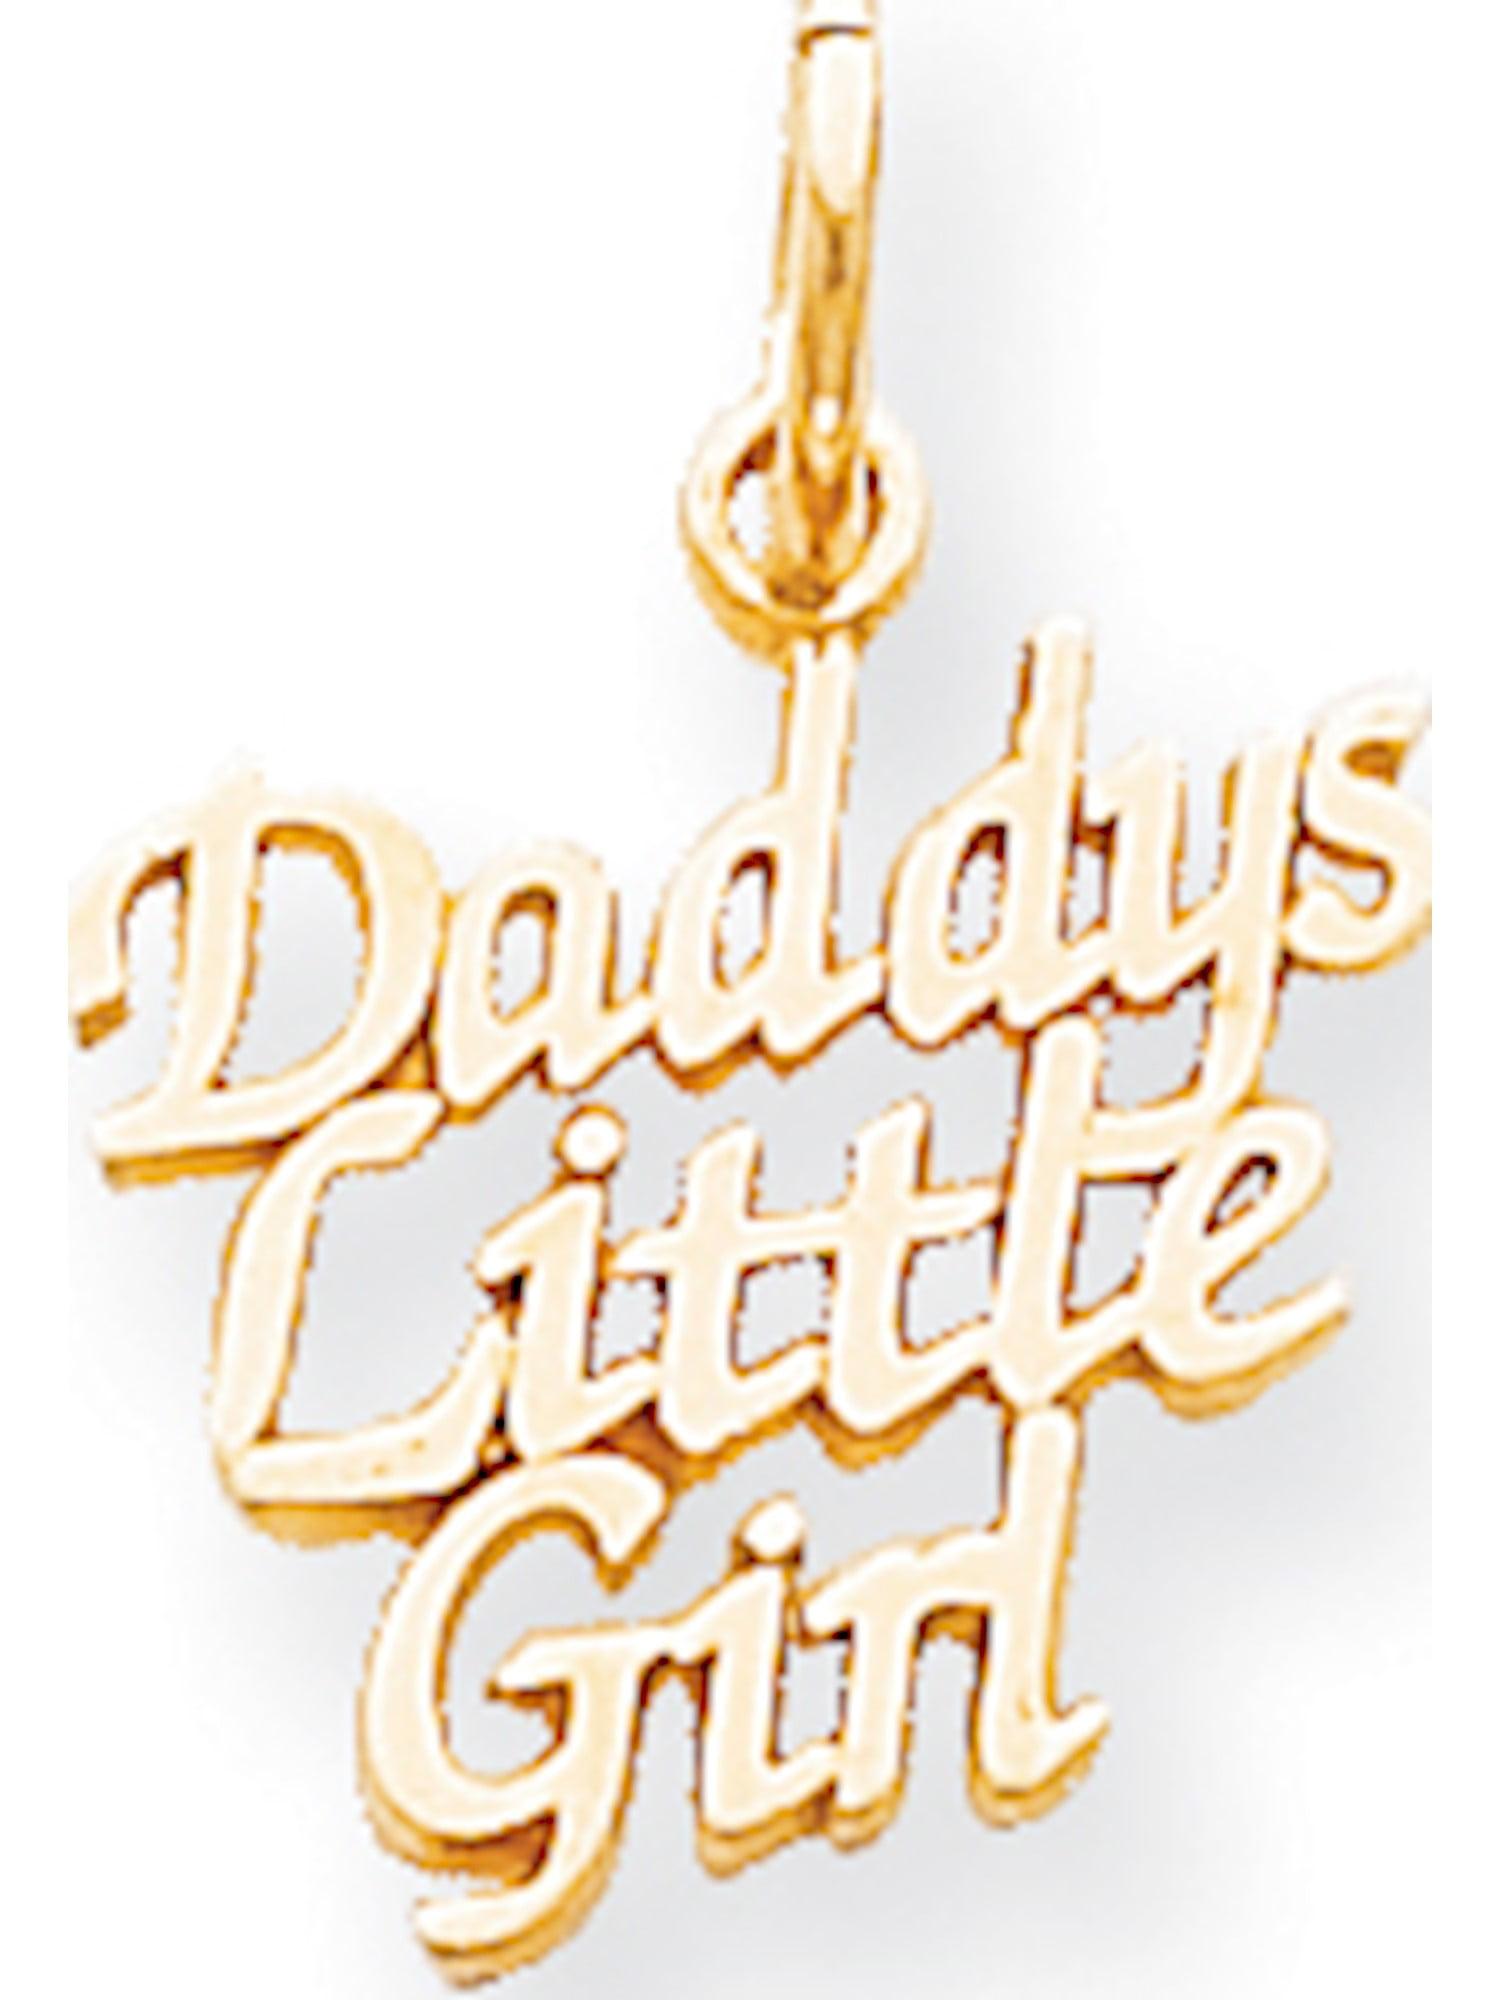 10k Yellow Gold Daddys Little Girl (8x24mm) Pendant / Charm